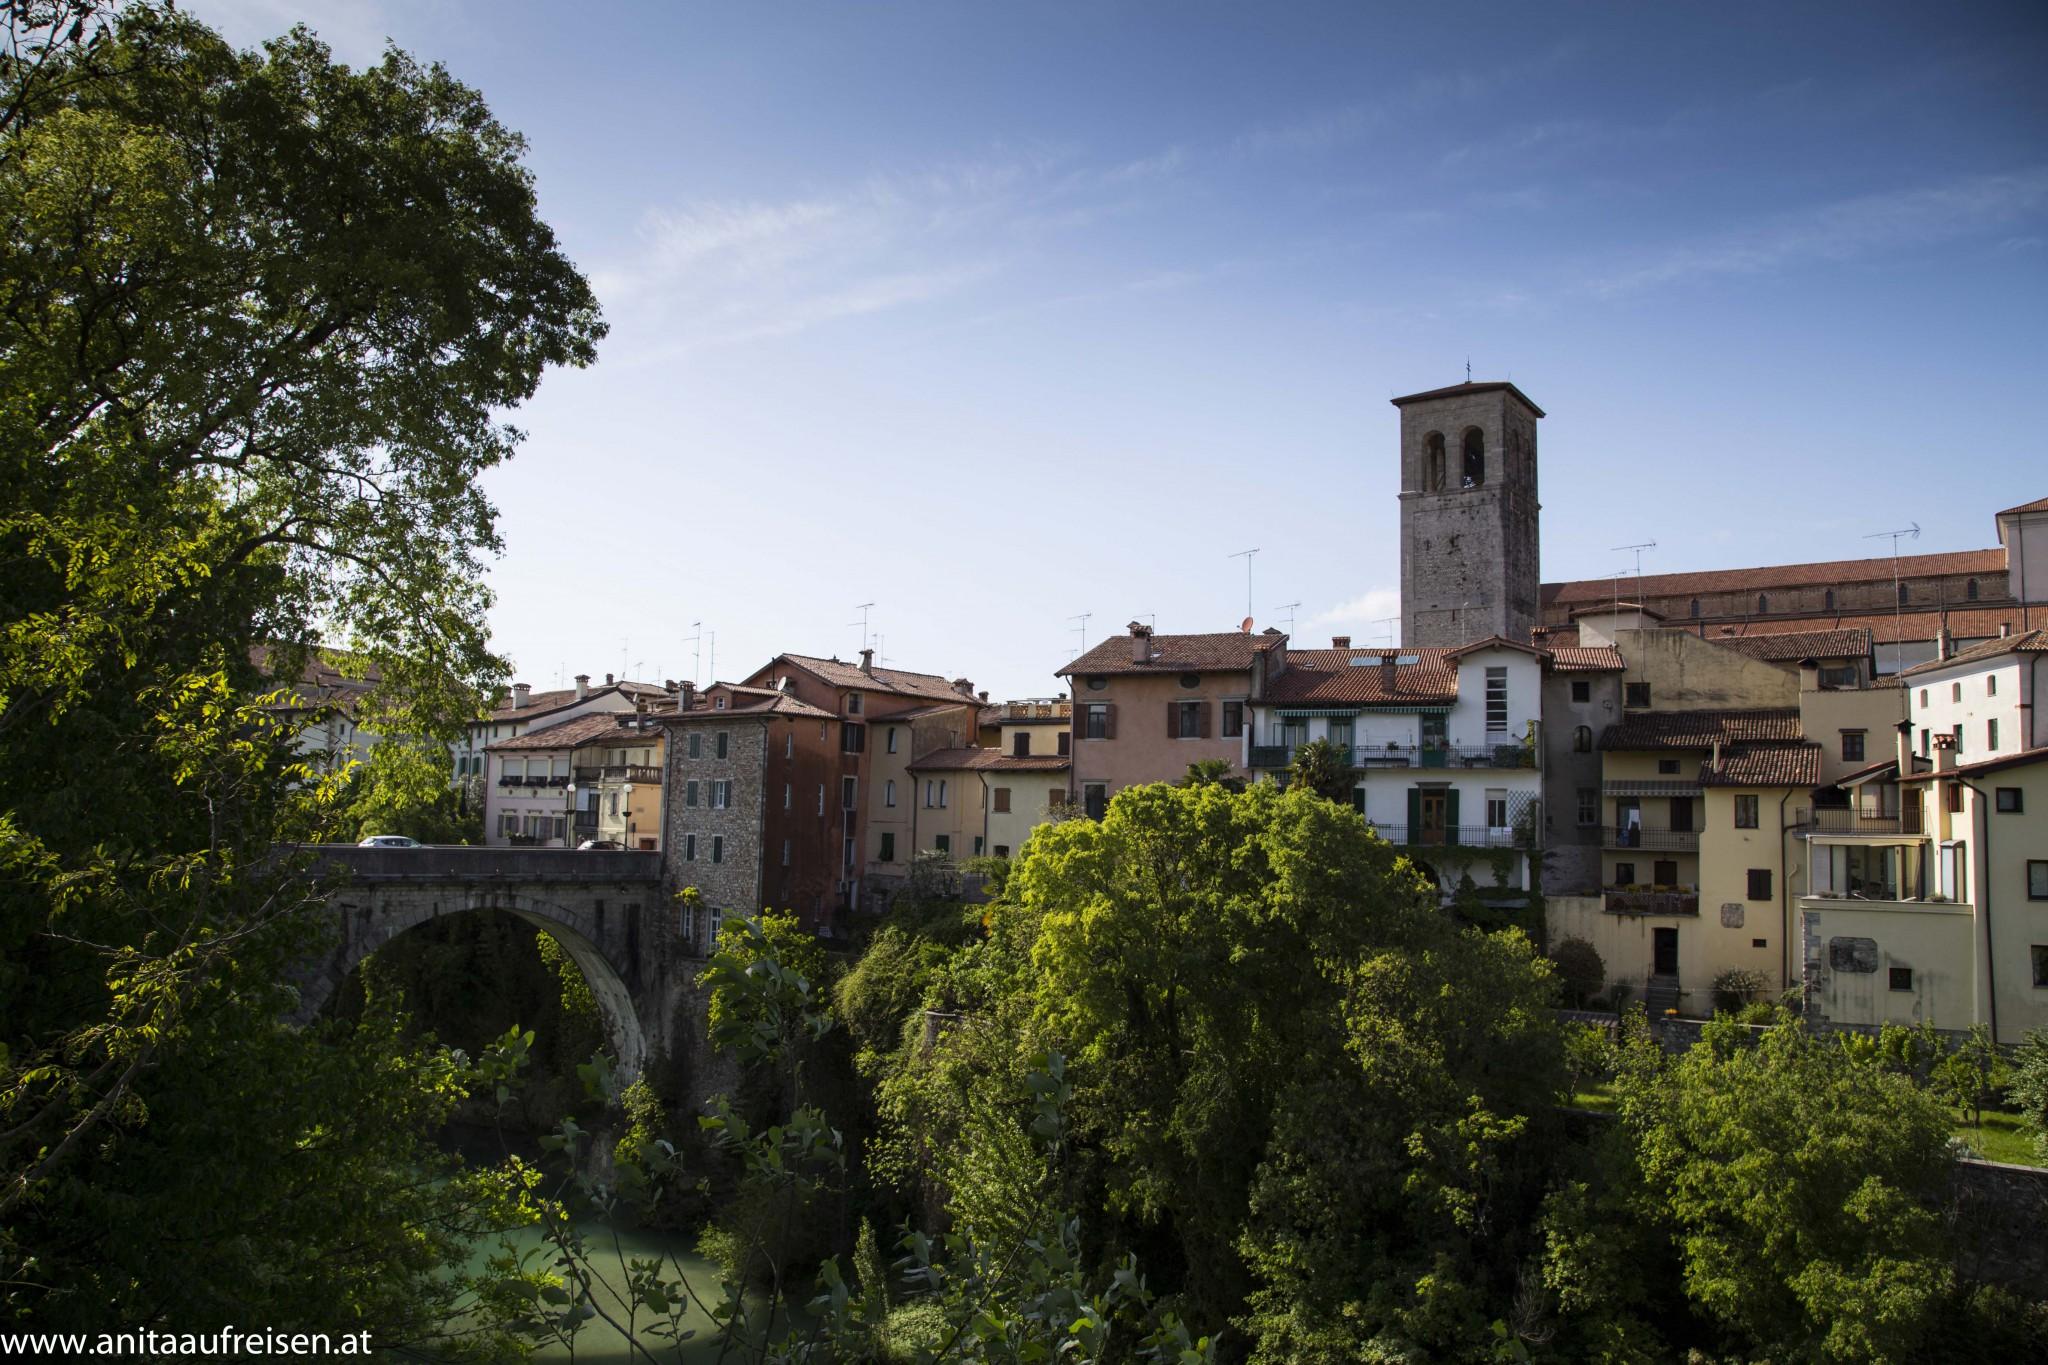 Teufelsbrücke Cividale del Friuli